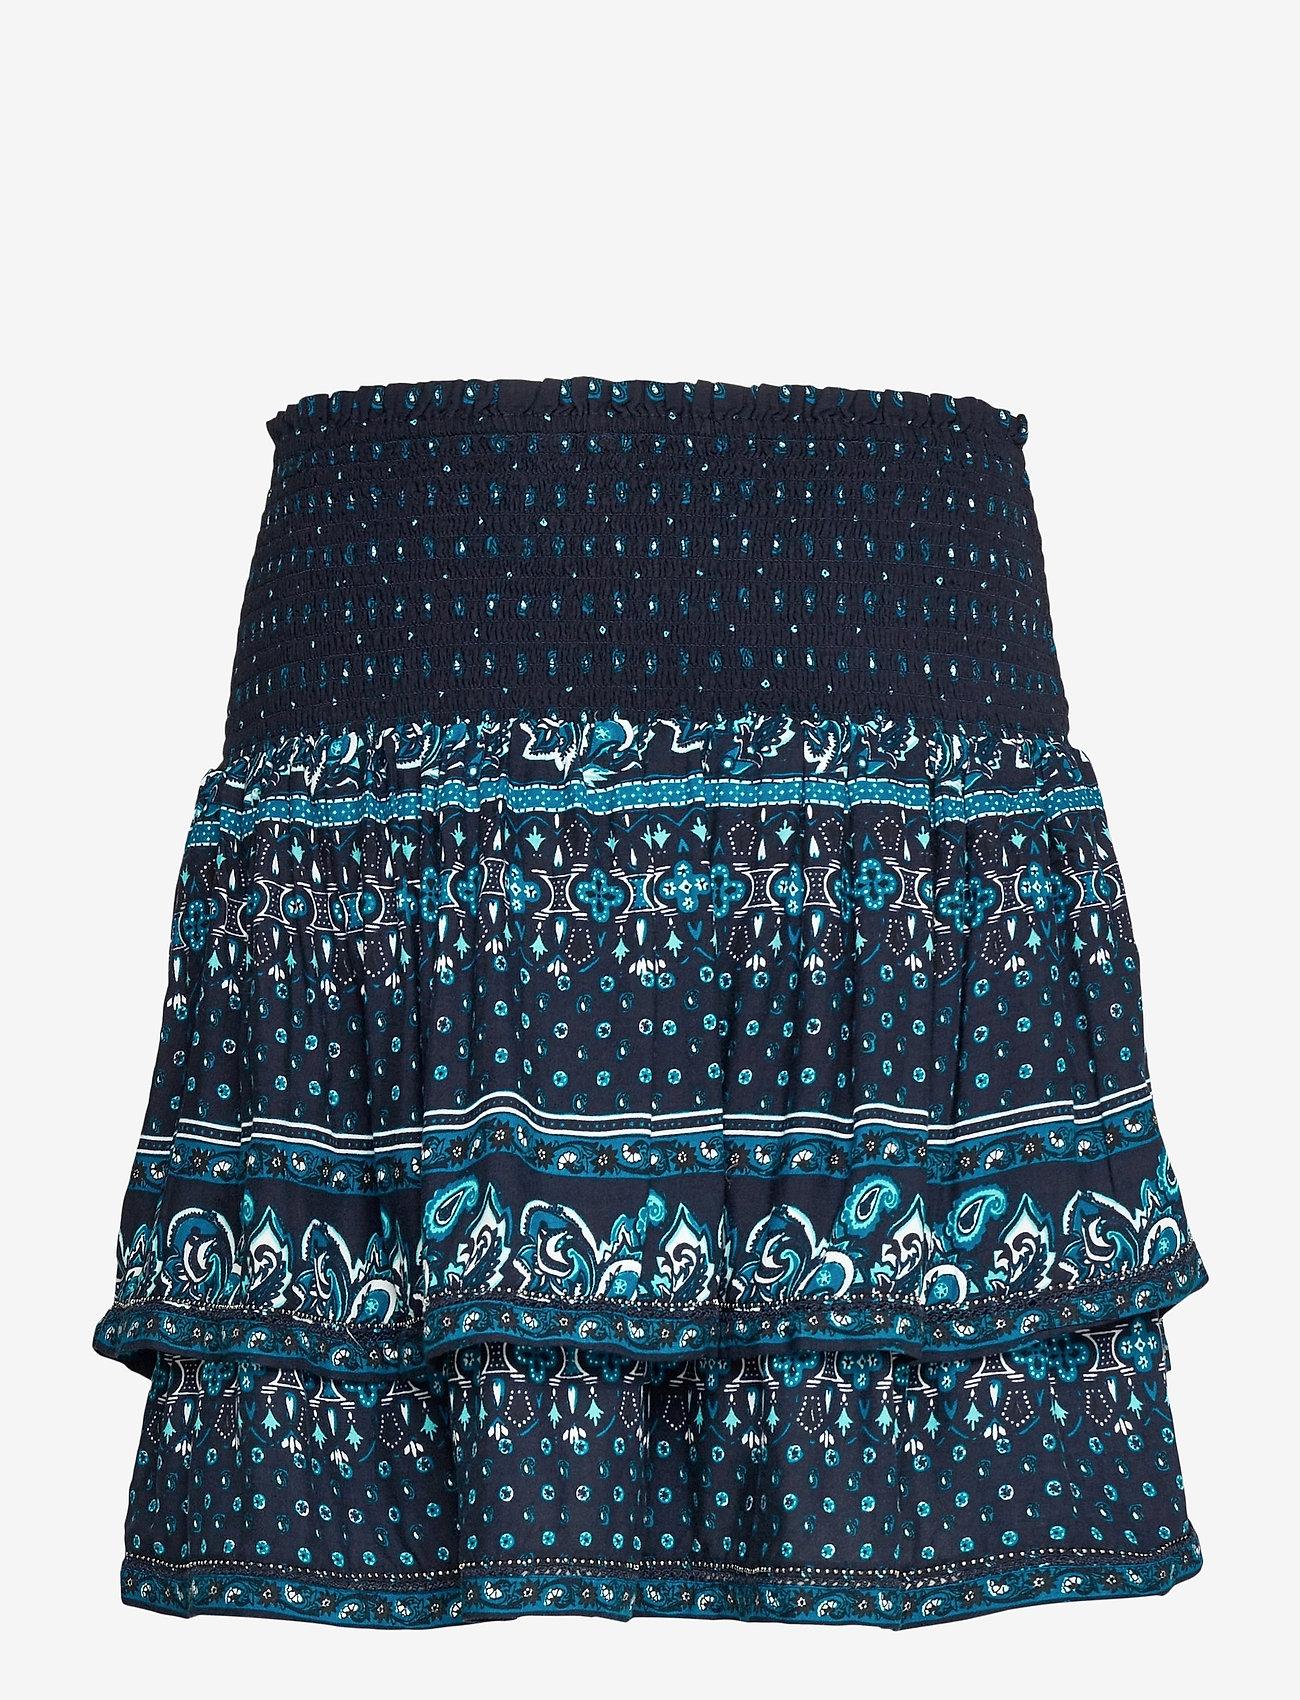 Superdry - AMEERA MINI SMOCKED SKIRT - short skirts - navy - 1